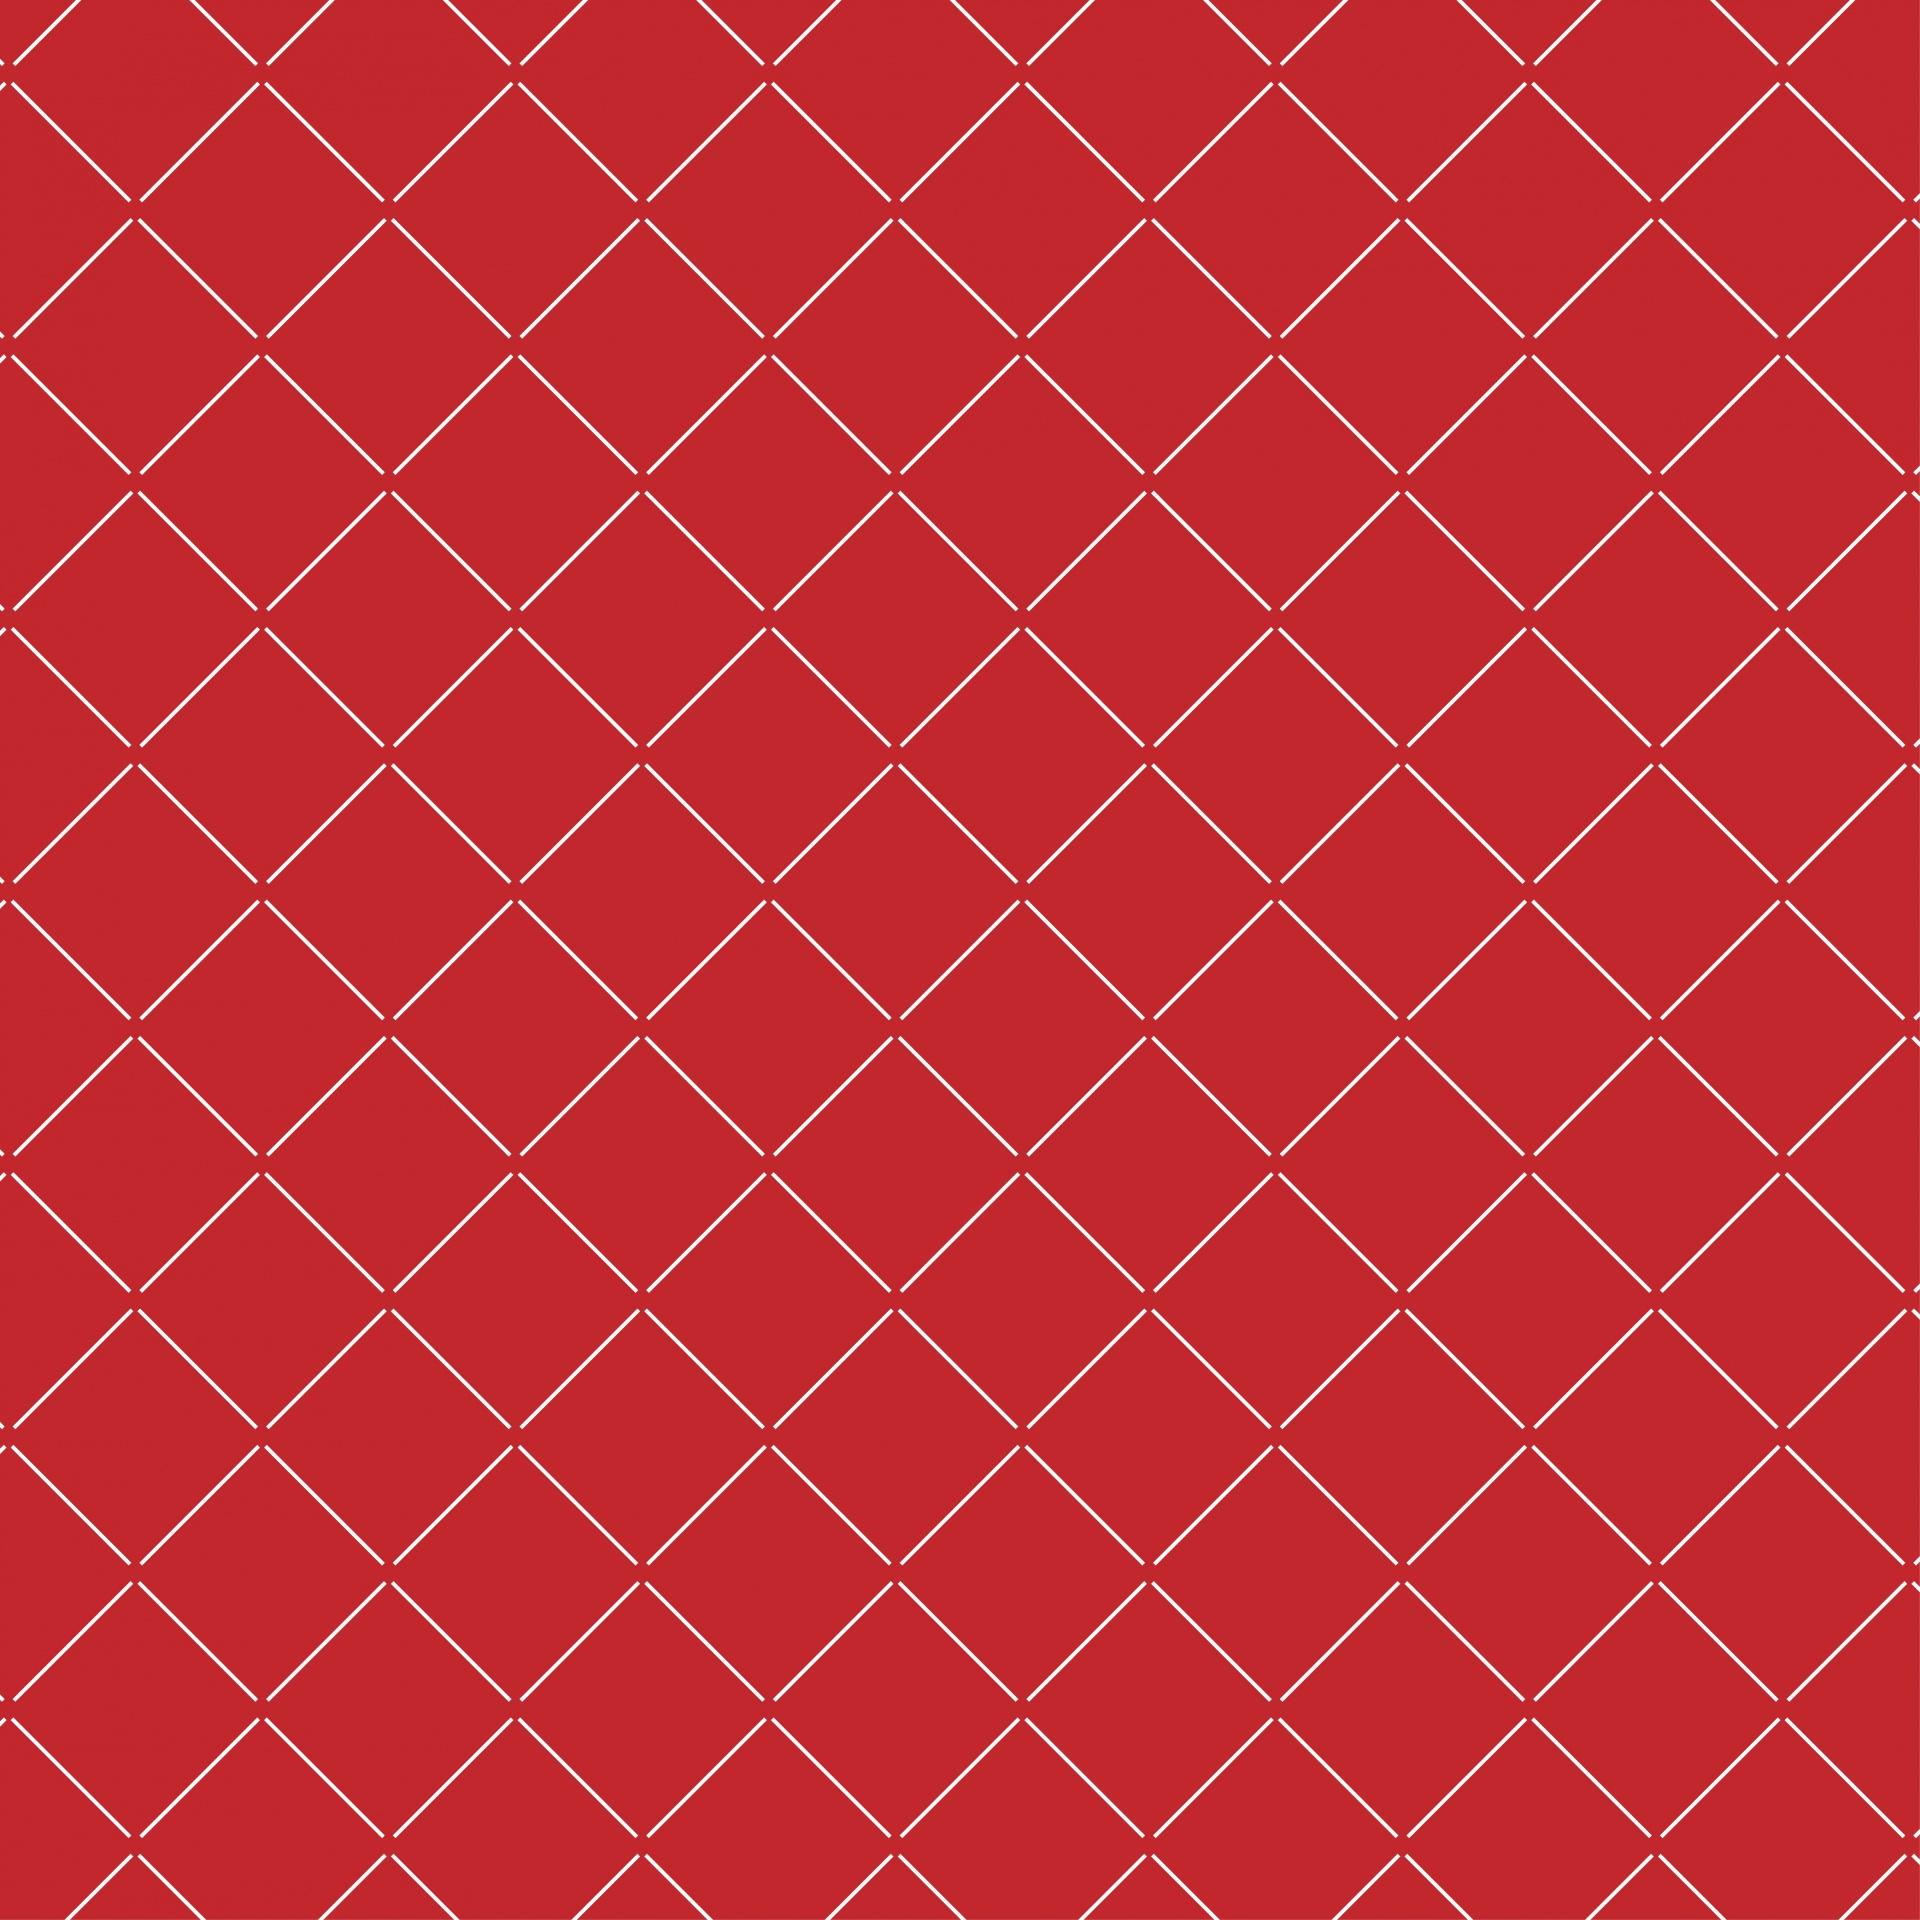 Squares Diamonds Tiles Wallpaper